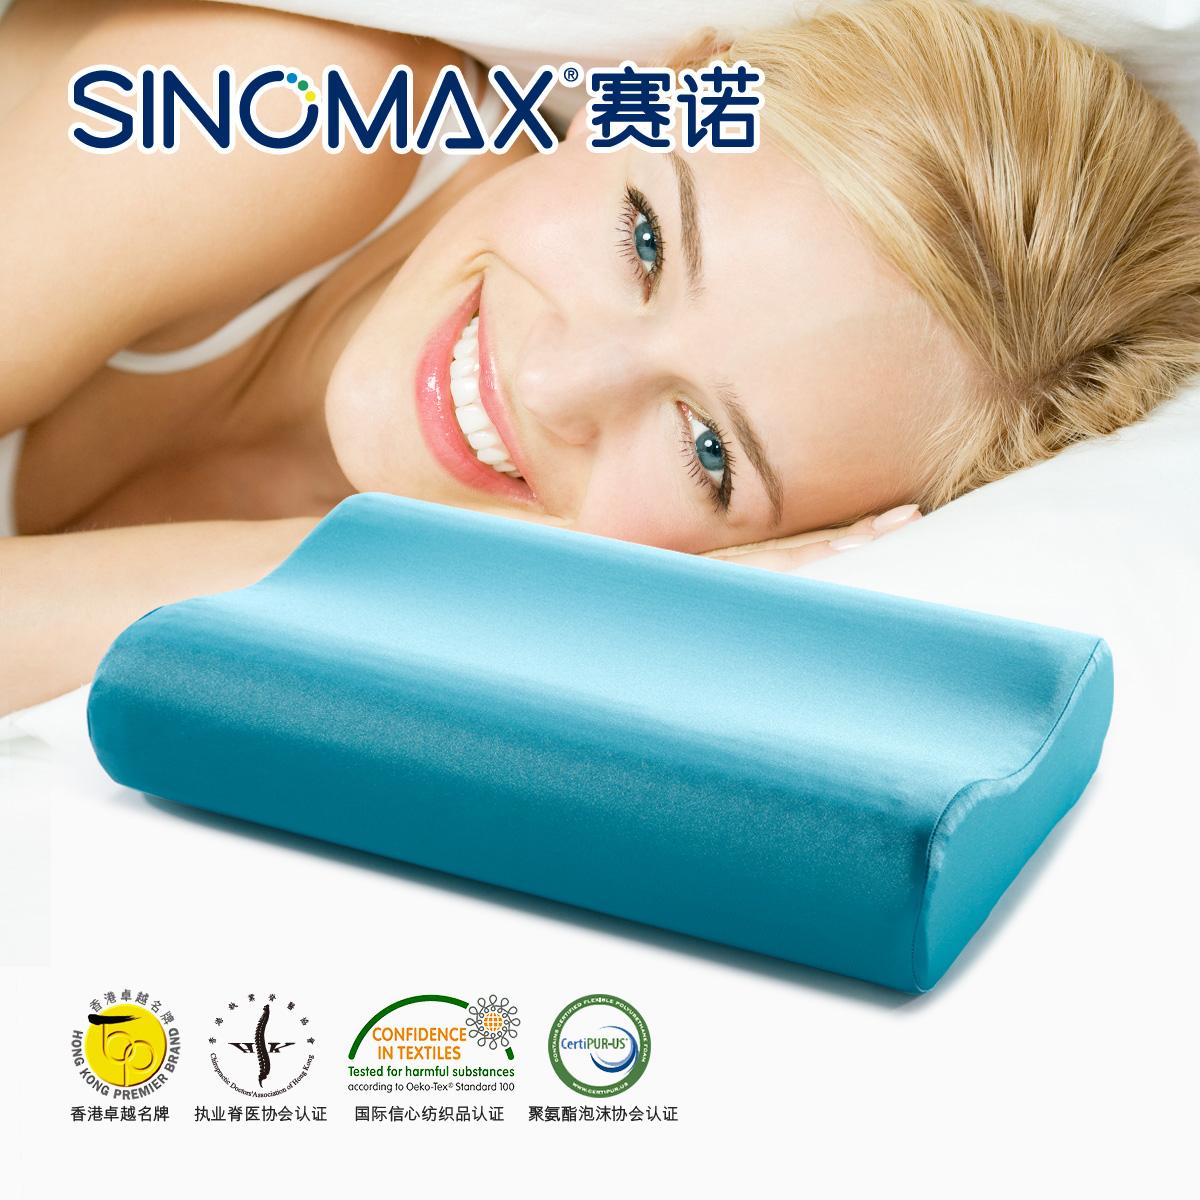 sinomax赛诺沁冰乐枕PP-058